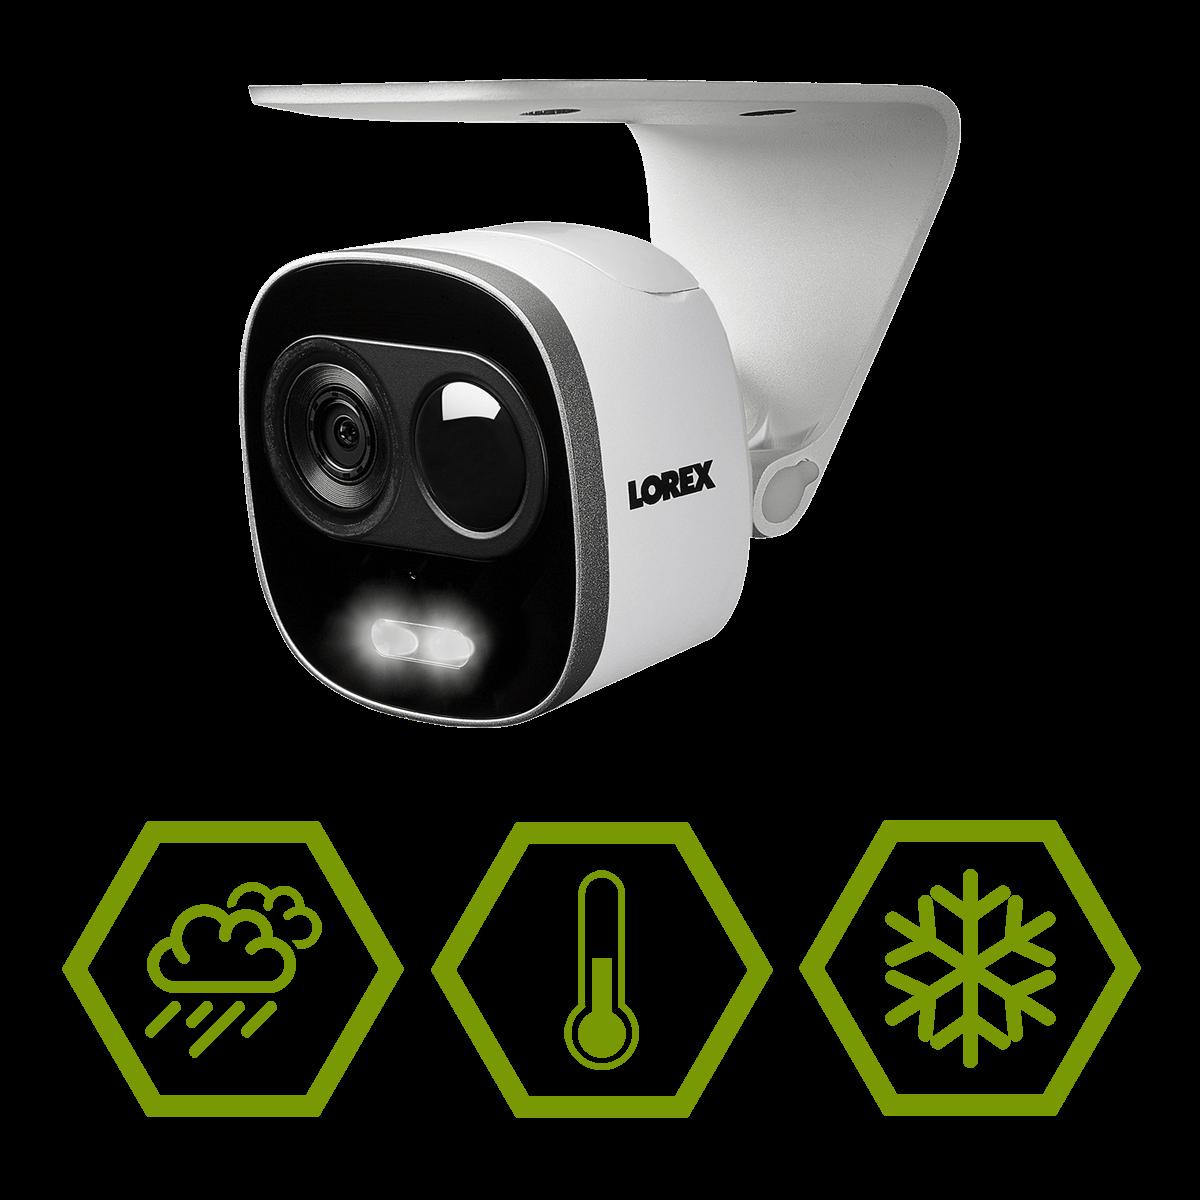 IP65 weatherproof wifi camera